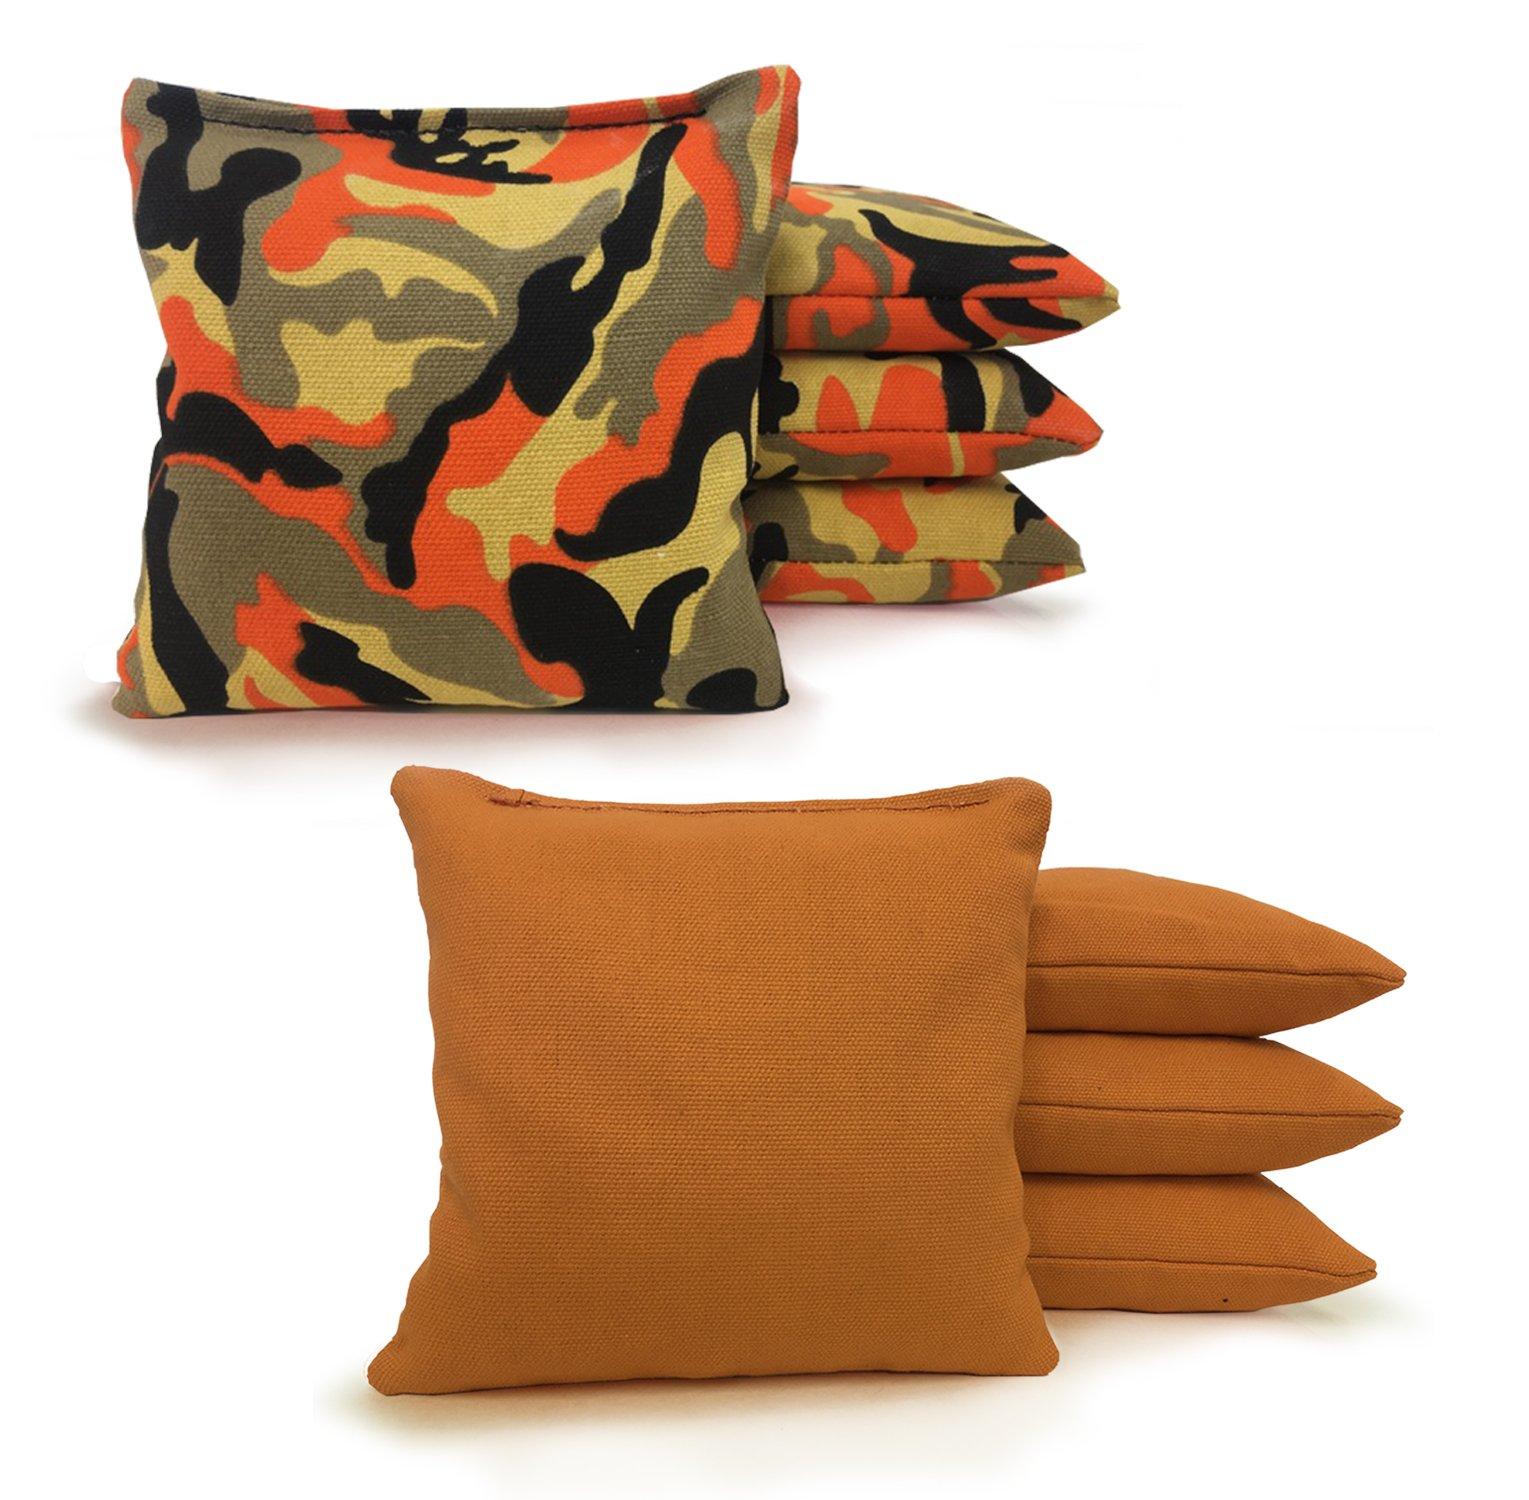 Johnson Enterprises, LLC 8 Standard Corn Filled Regulation Duck Cloth Cornhole Bags 17 Colors Available (You Pick)!! (Orange Camo/Gold) by Johnson Enterprises, LLC